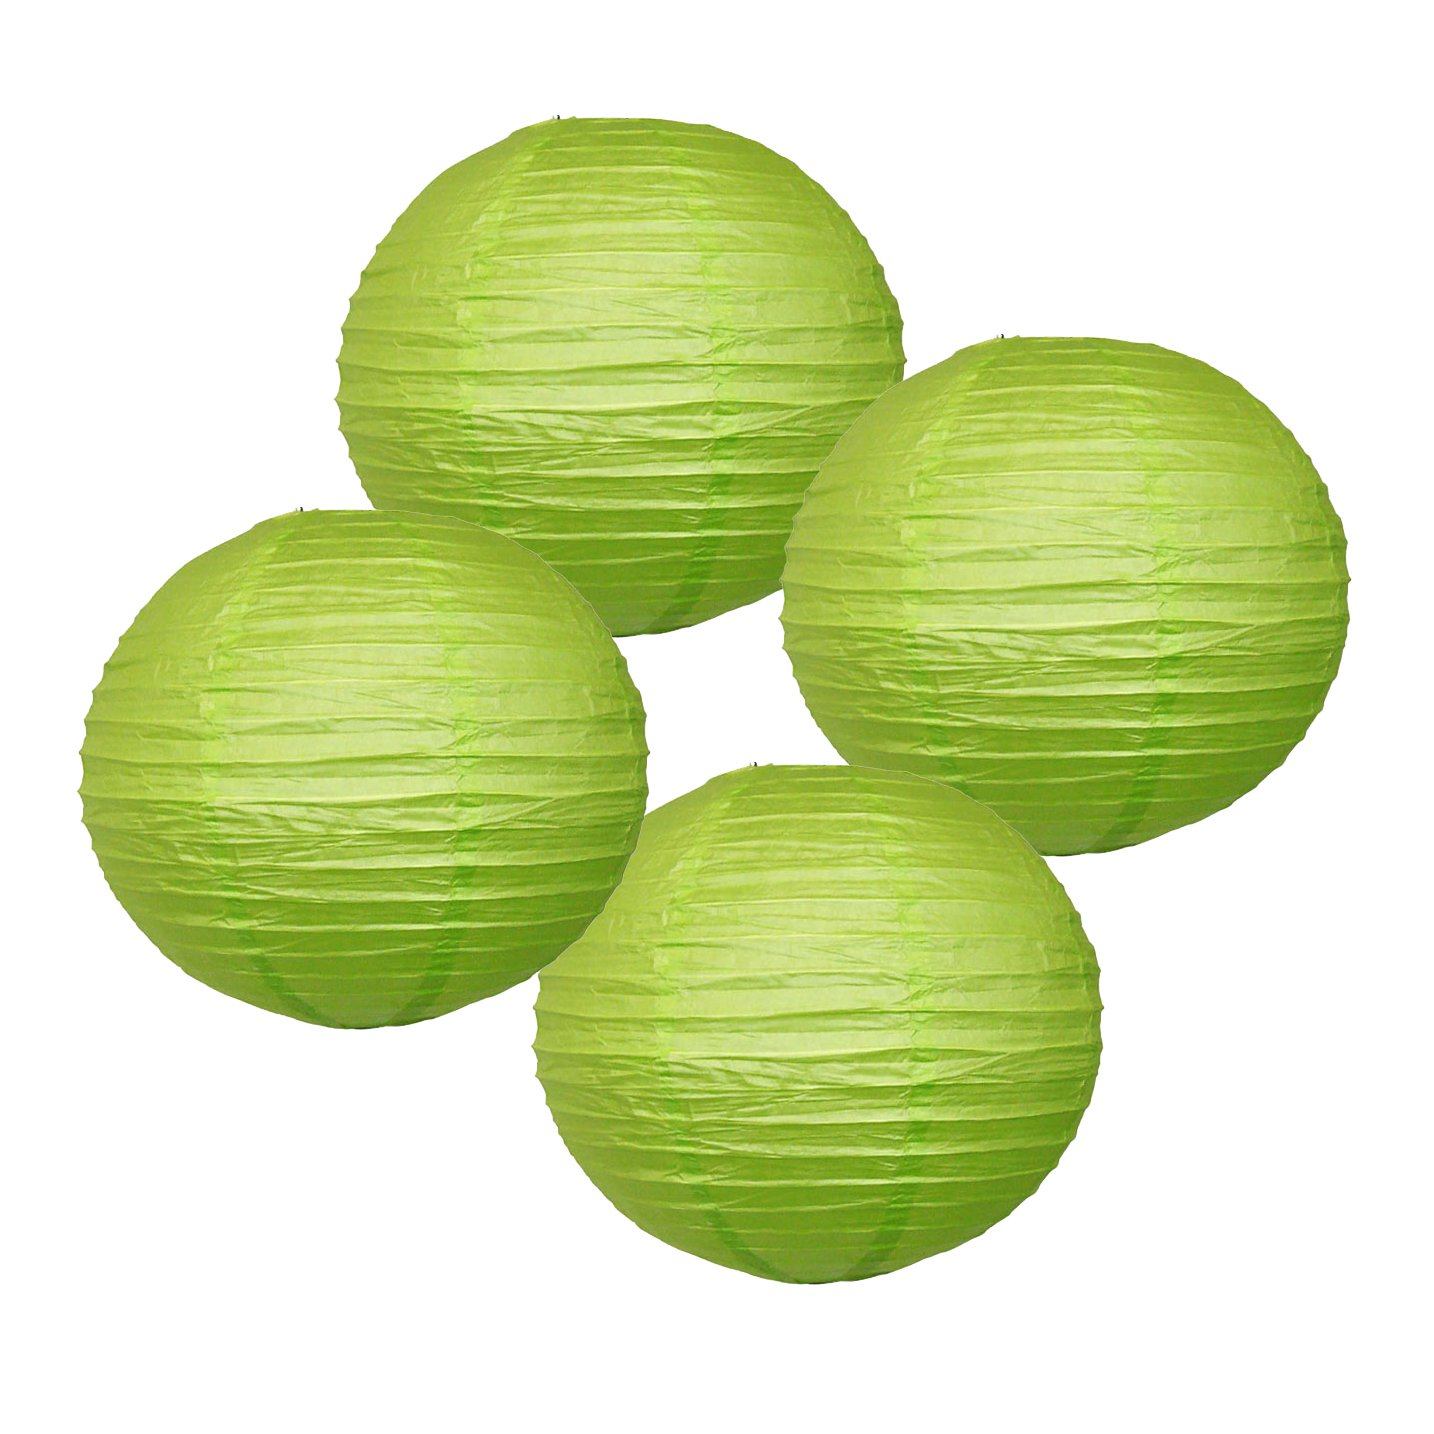 Just Artifacts 様々な紙製ランタン(色とサイズの異なる紙のランタン) 6inch AMZ-RPL4-060017 B01EGXJXN6 6inch|ライトグリーン ライトグリーン 6inch